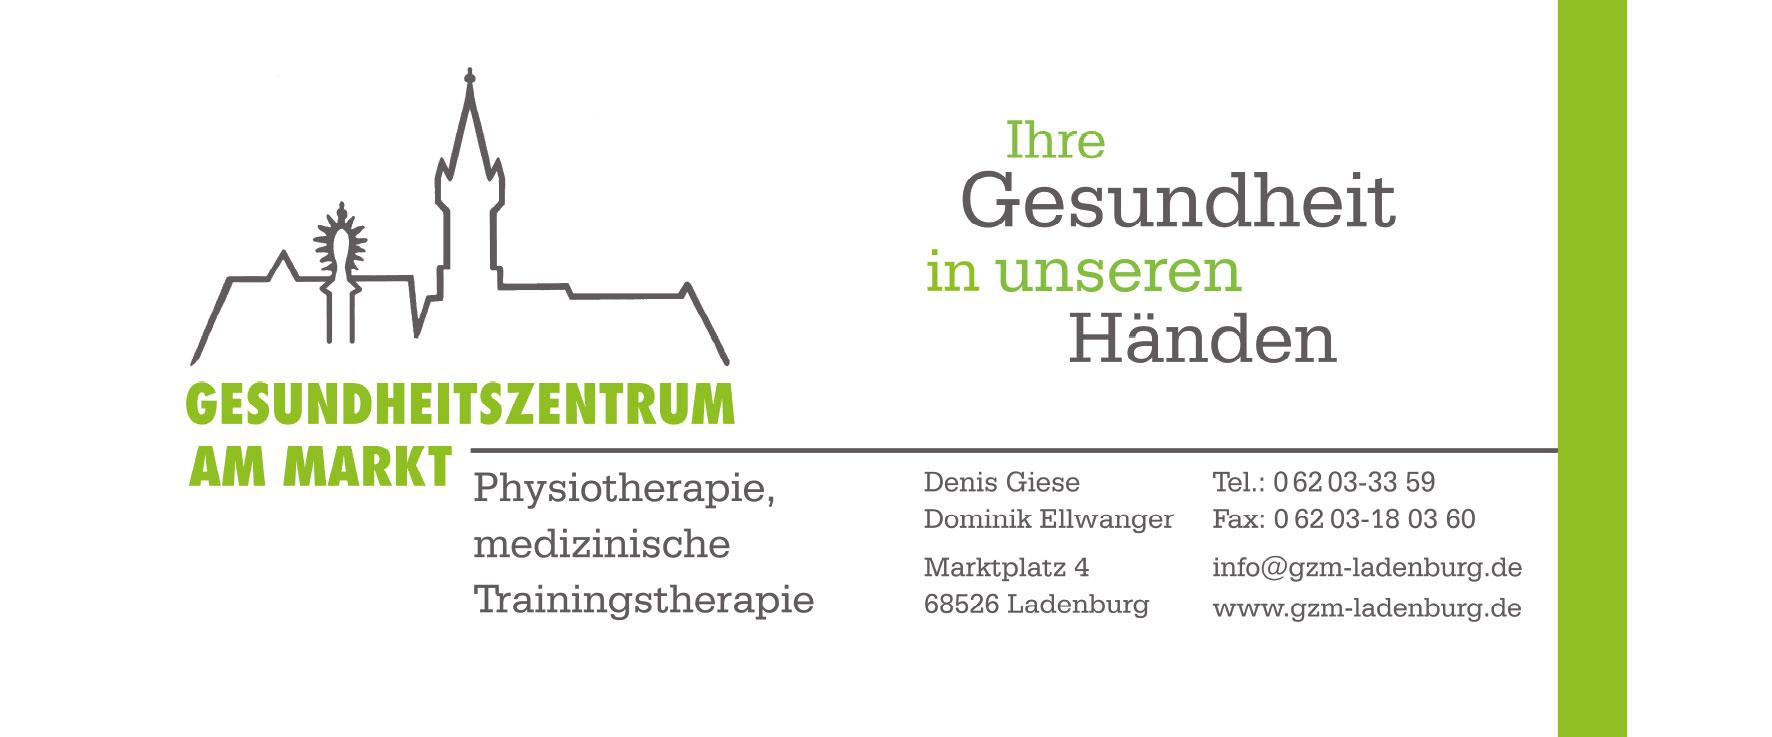 Sponsoren-Logos_Gesundheitszentrum_1